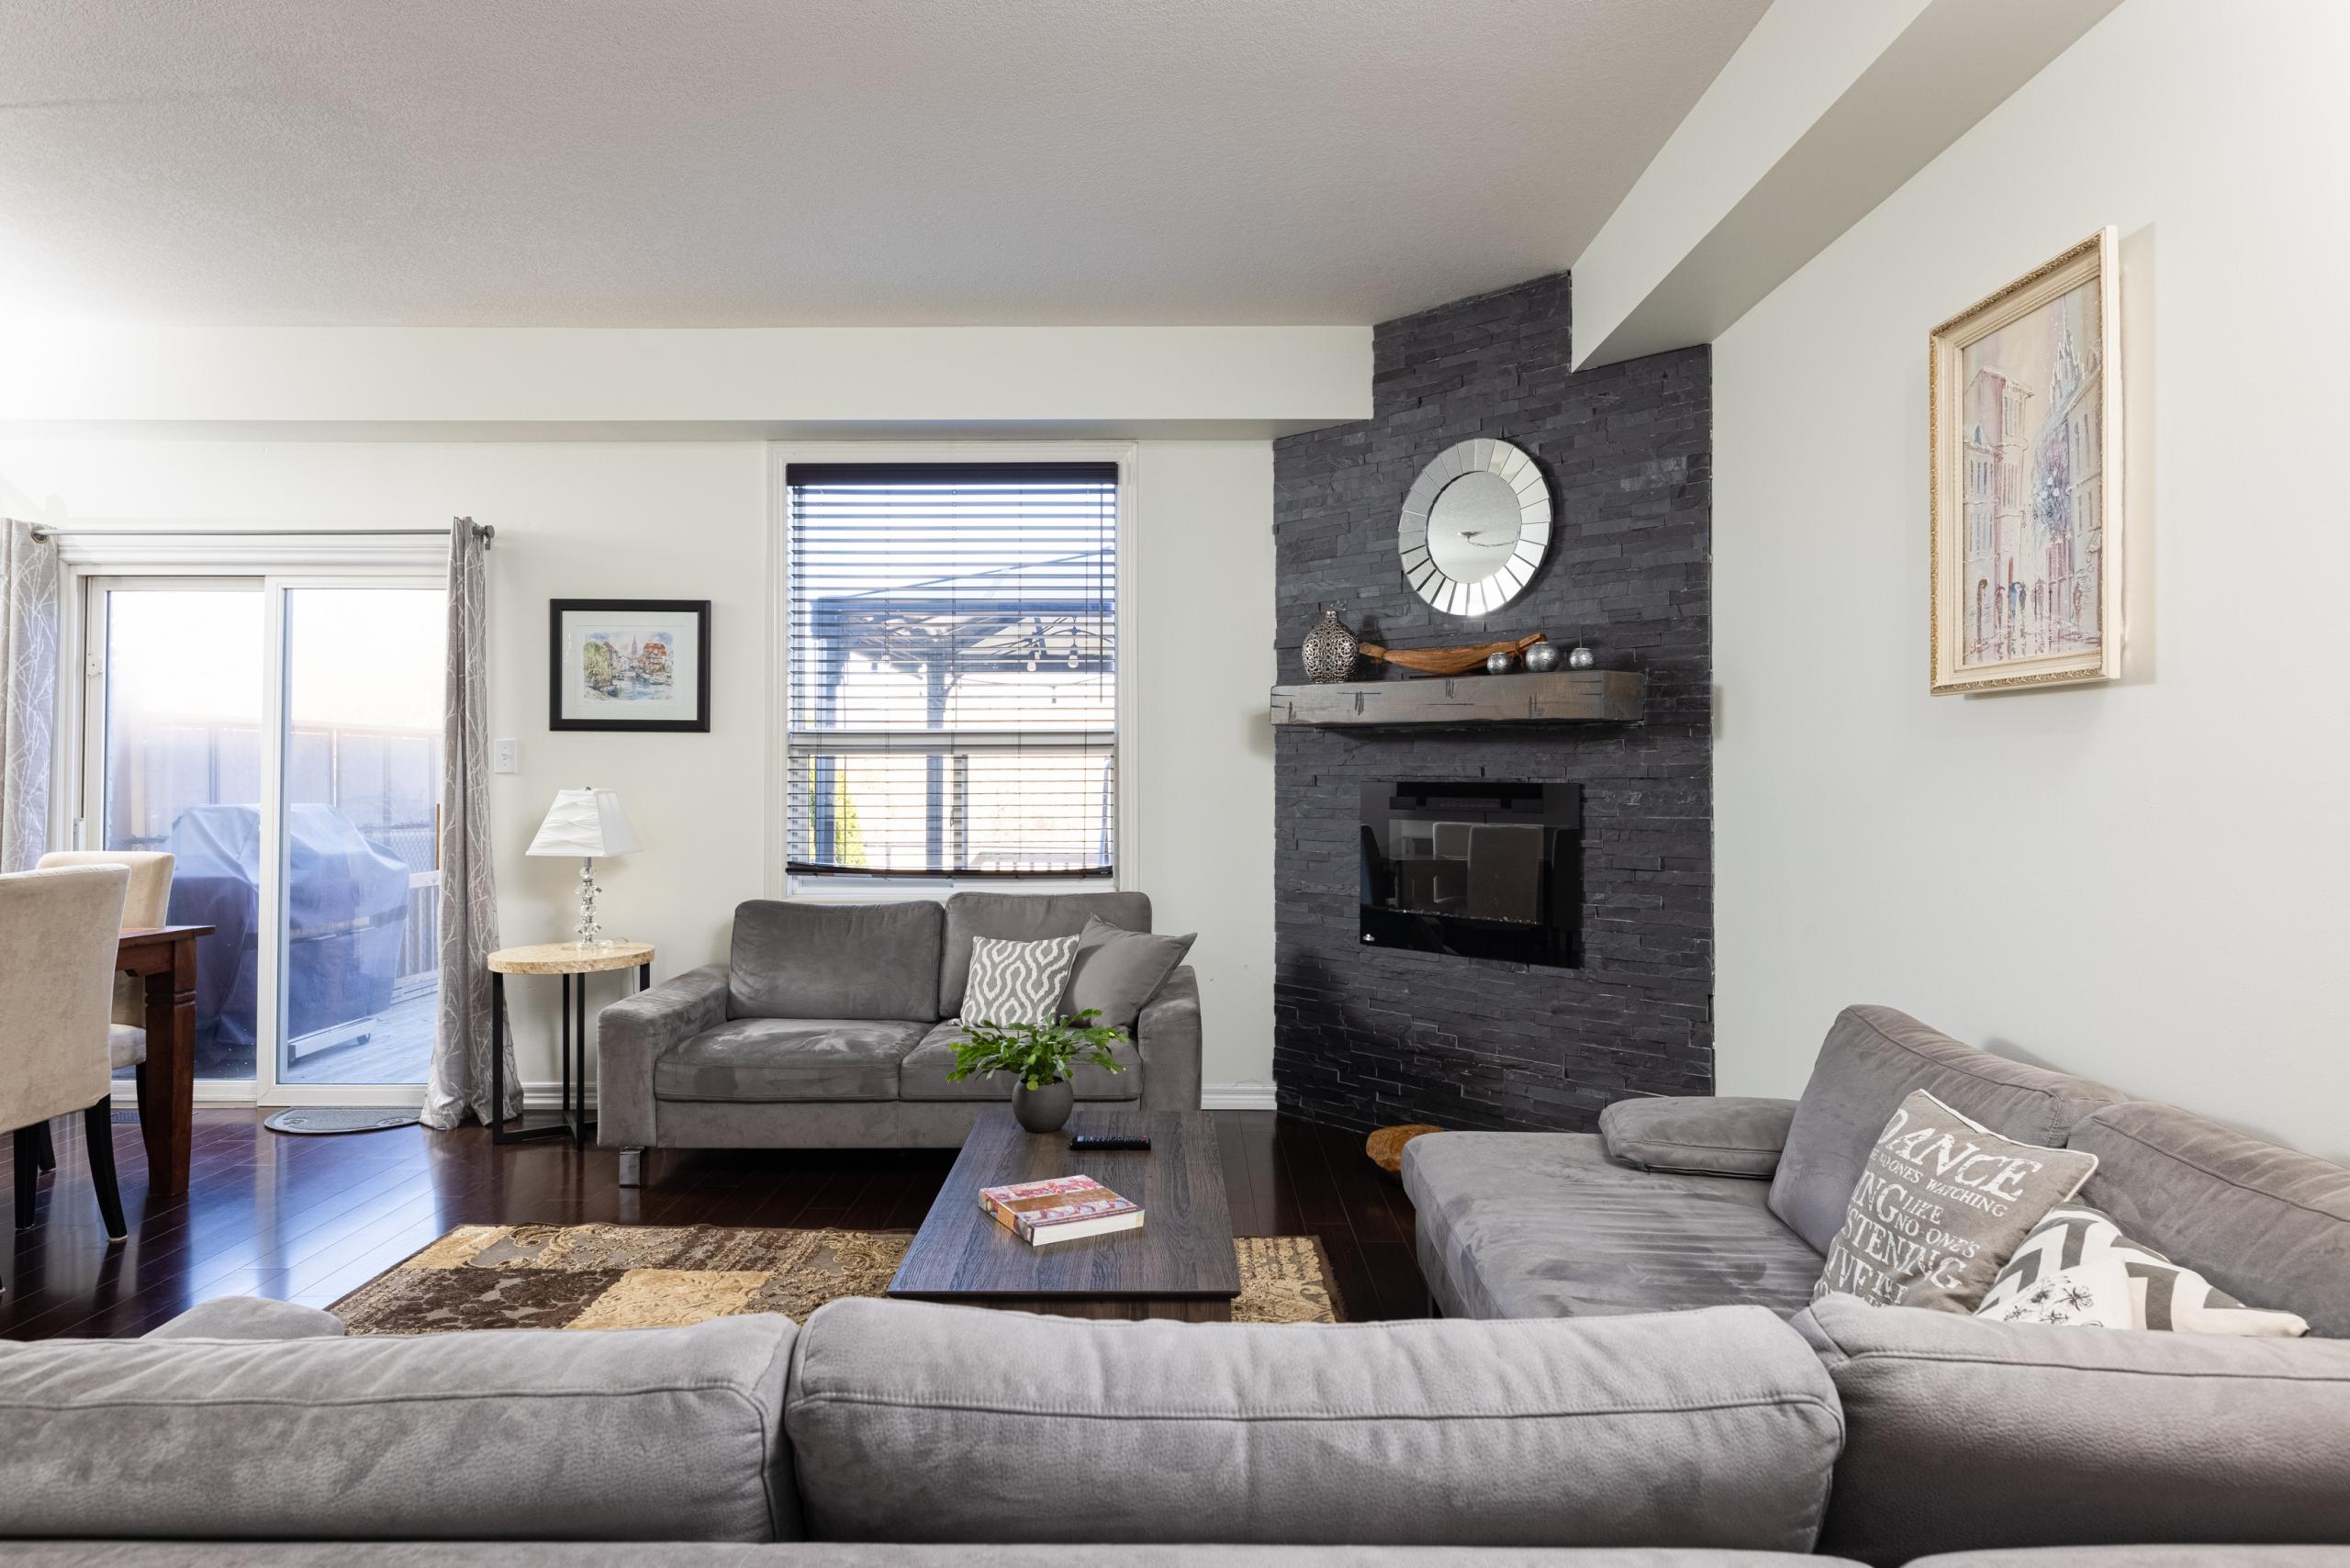 Living room featured at 5321 Scotia Street, Burlington at Alex Irish & Associates